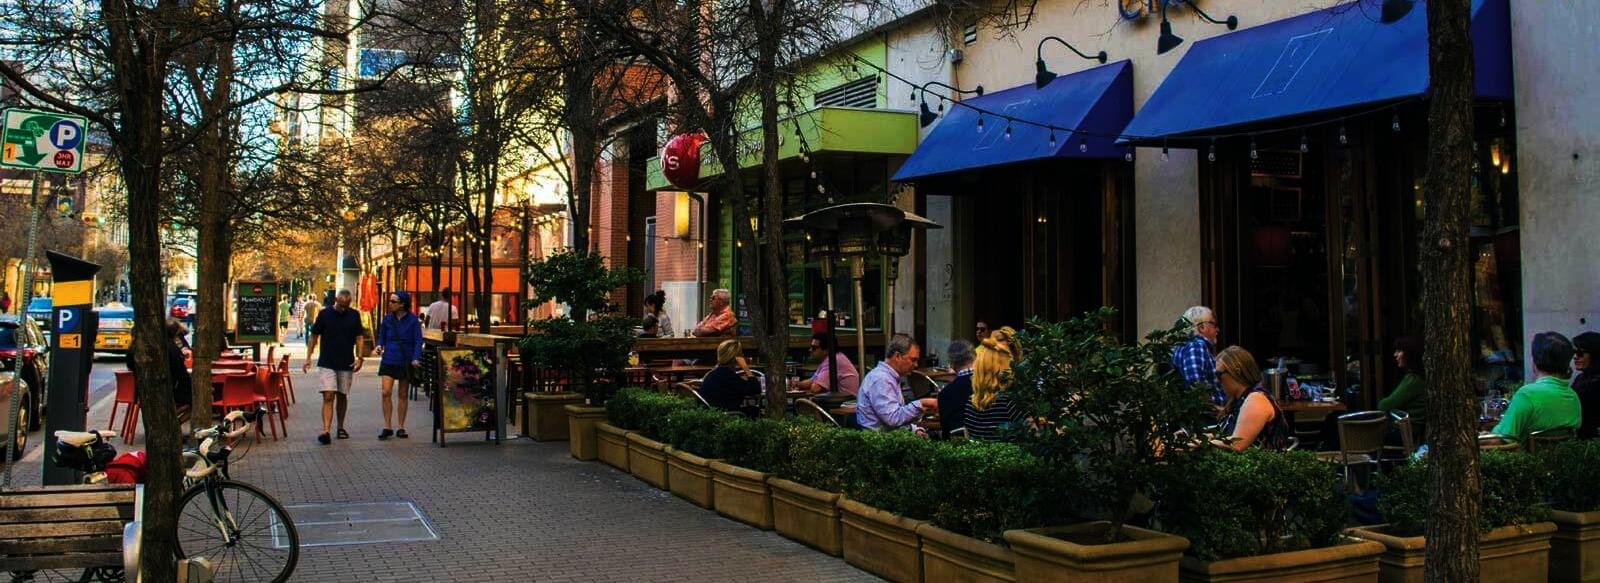 2nd Street - Austin, TX